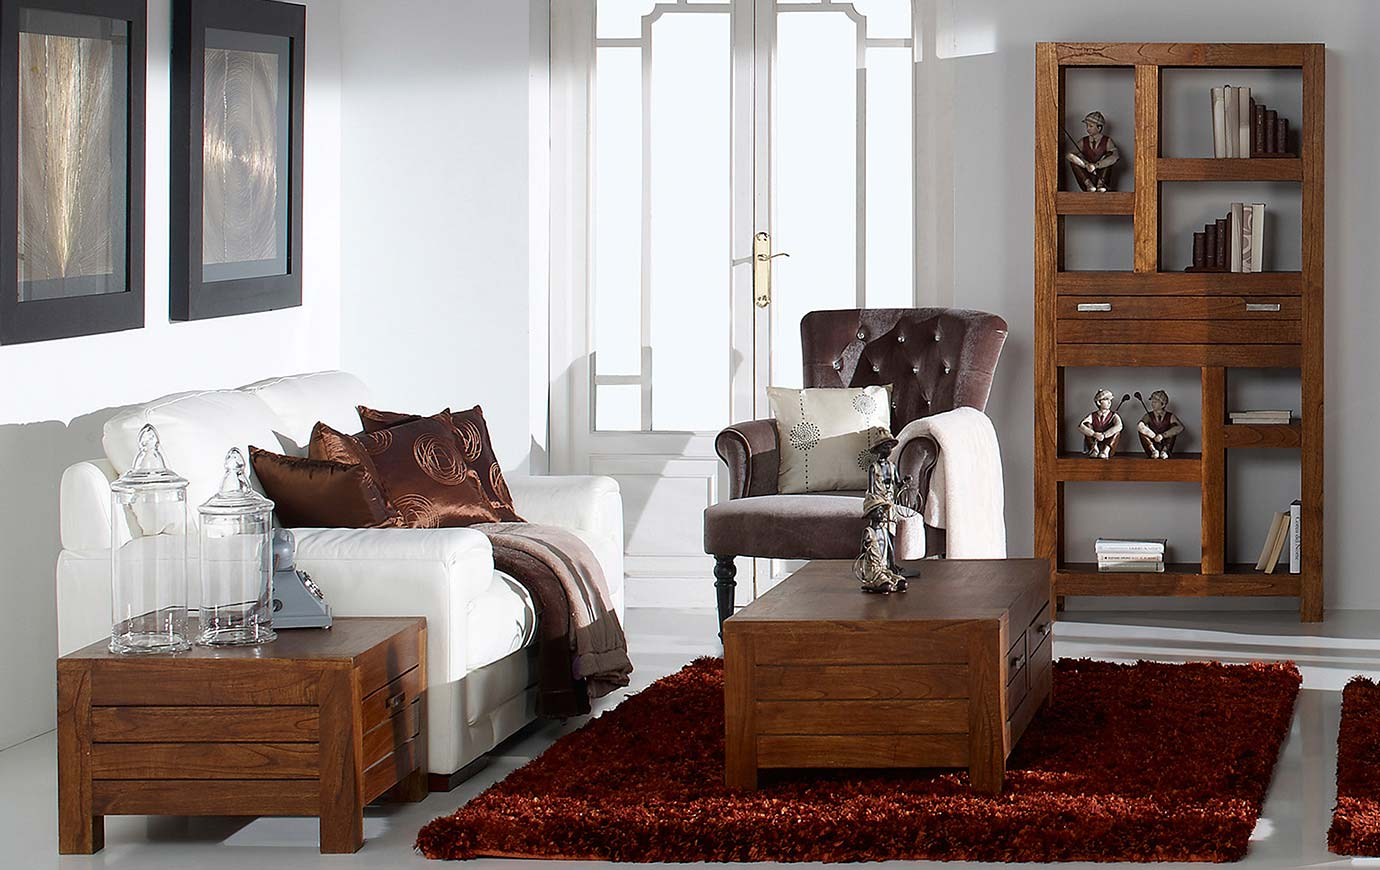 muebles estilo zen colonial de madera mindi colecci n ohio